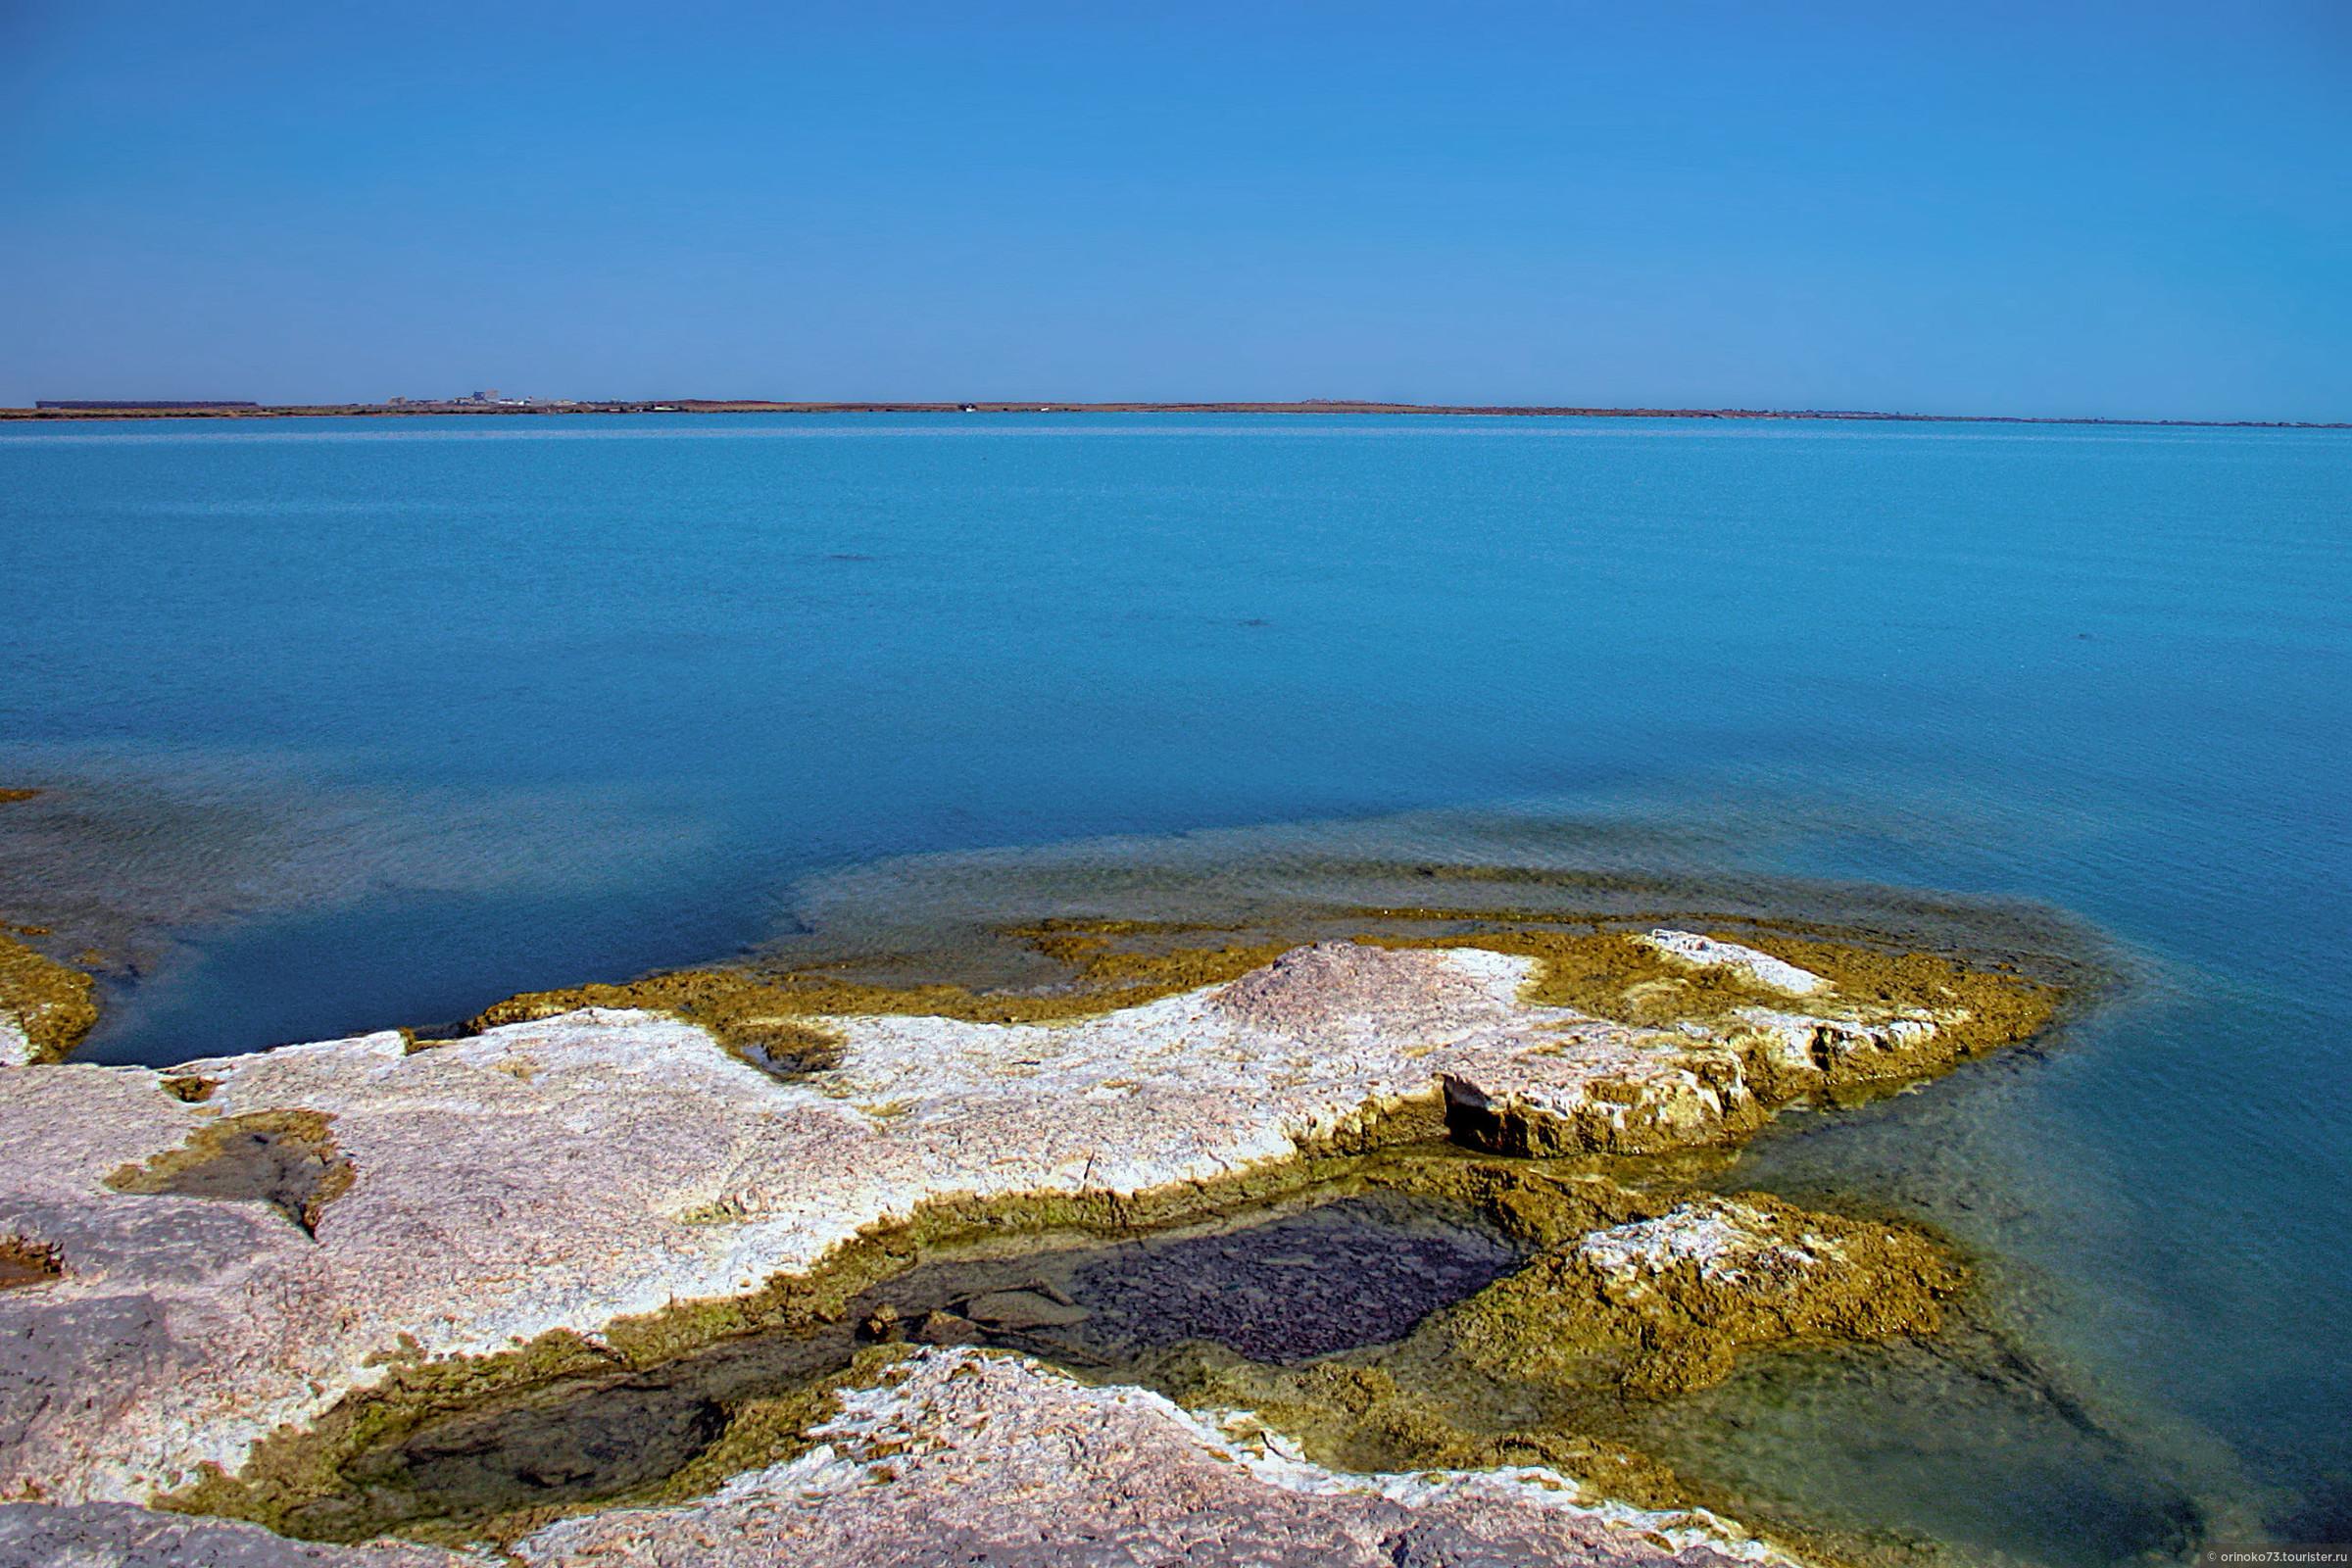 Картинки озера балхаш в казахстане